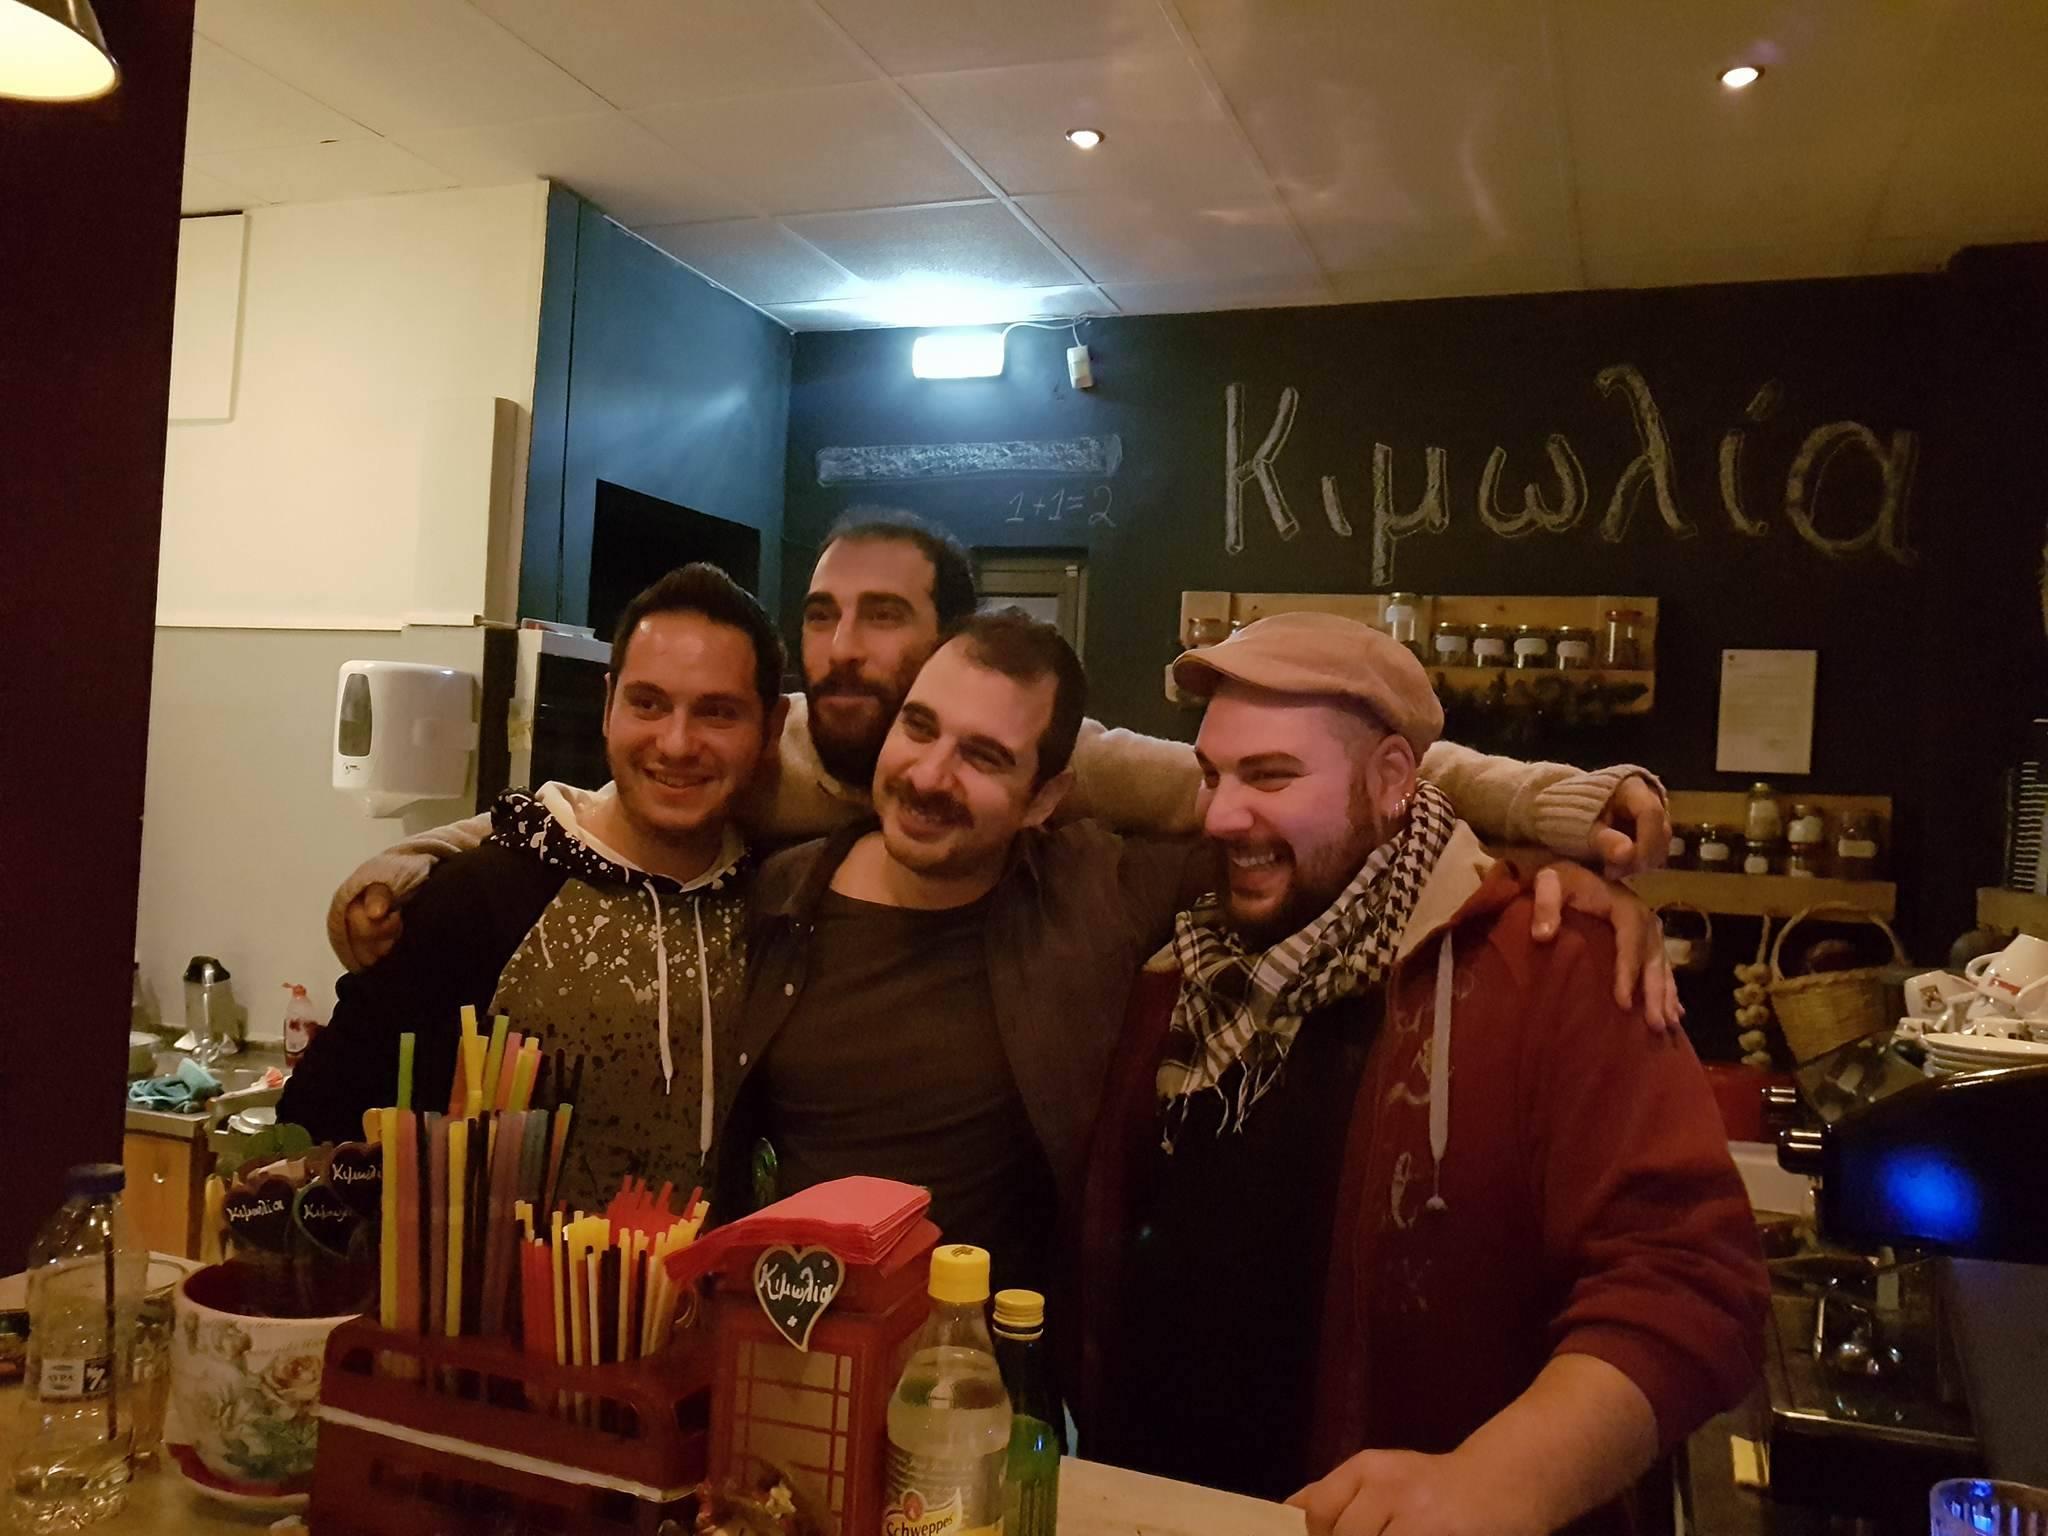 "kozan.gr: Ο Βύρων Θεοδωρόπουλος και ο Μιχάλης Μαθιουδάκης, πρόσφεραν, το βράδυ του Σαββάτου, στο σύγχρονο καφενέ ""Κιμωλία"", ένα ξεκαρδιστικό Stand Up Comedy"